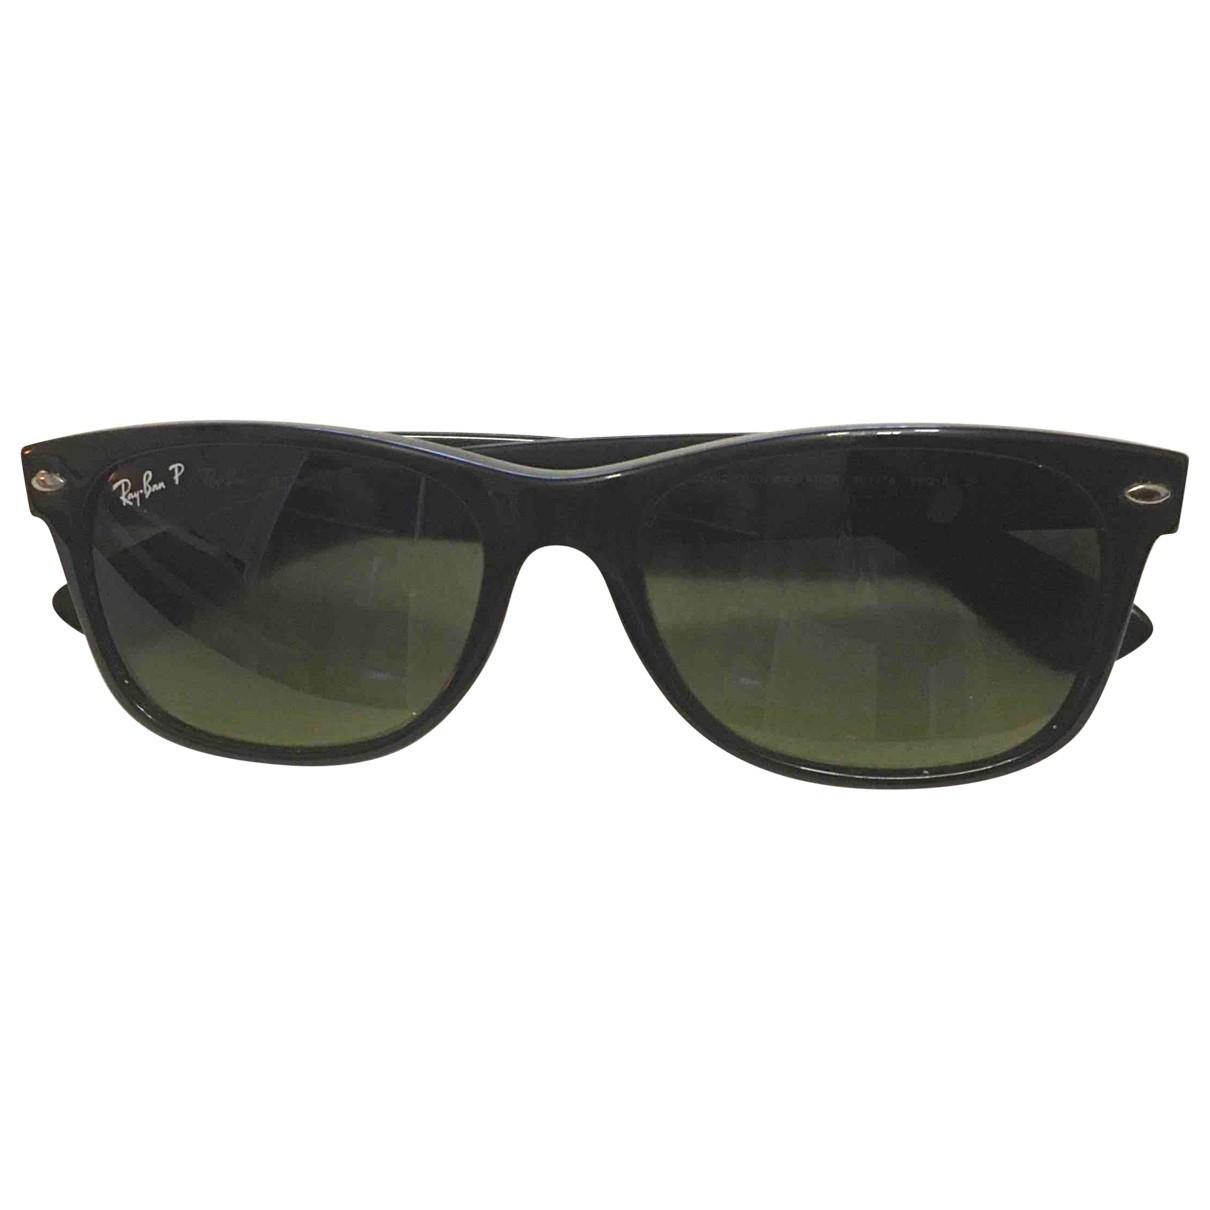 Ray-ban New Wayfarer Sonnenbrillen Schwarz